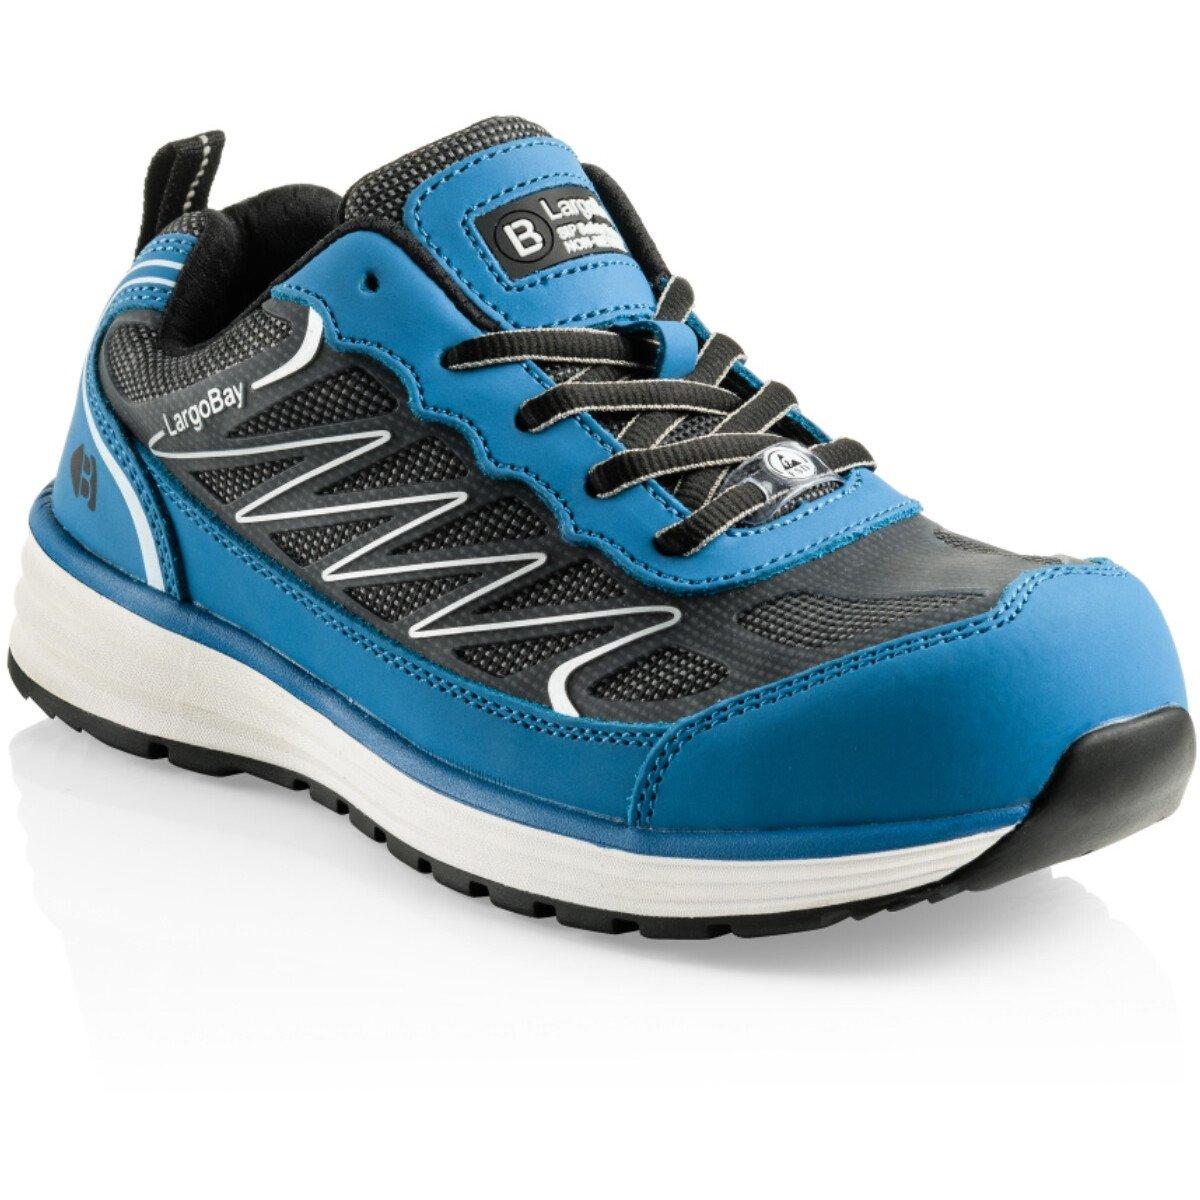 Buckler Boots Liz Largo Bay Ladies Blue Leather/KPU Non-Metallic Safety Trainer S1 P HRO SRC